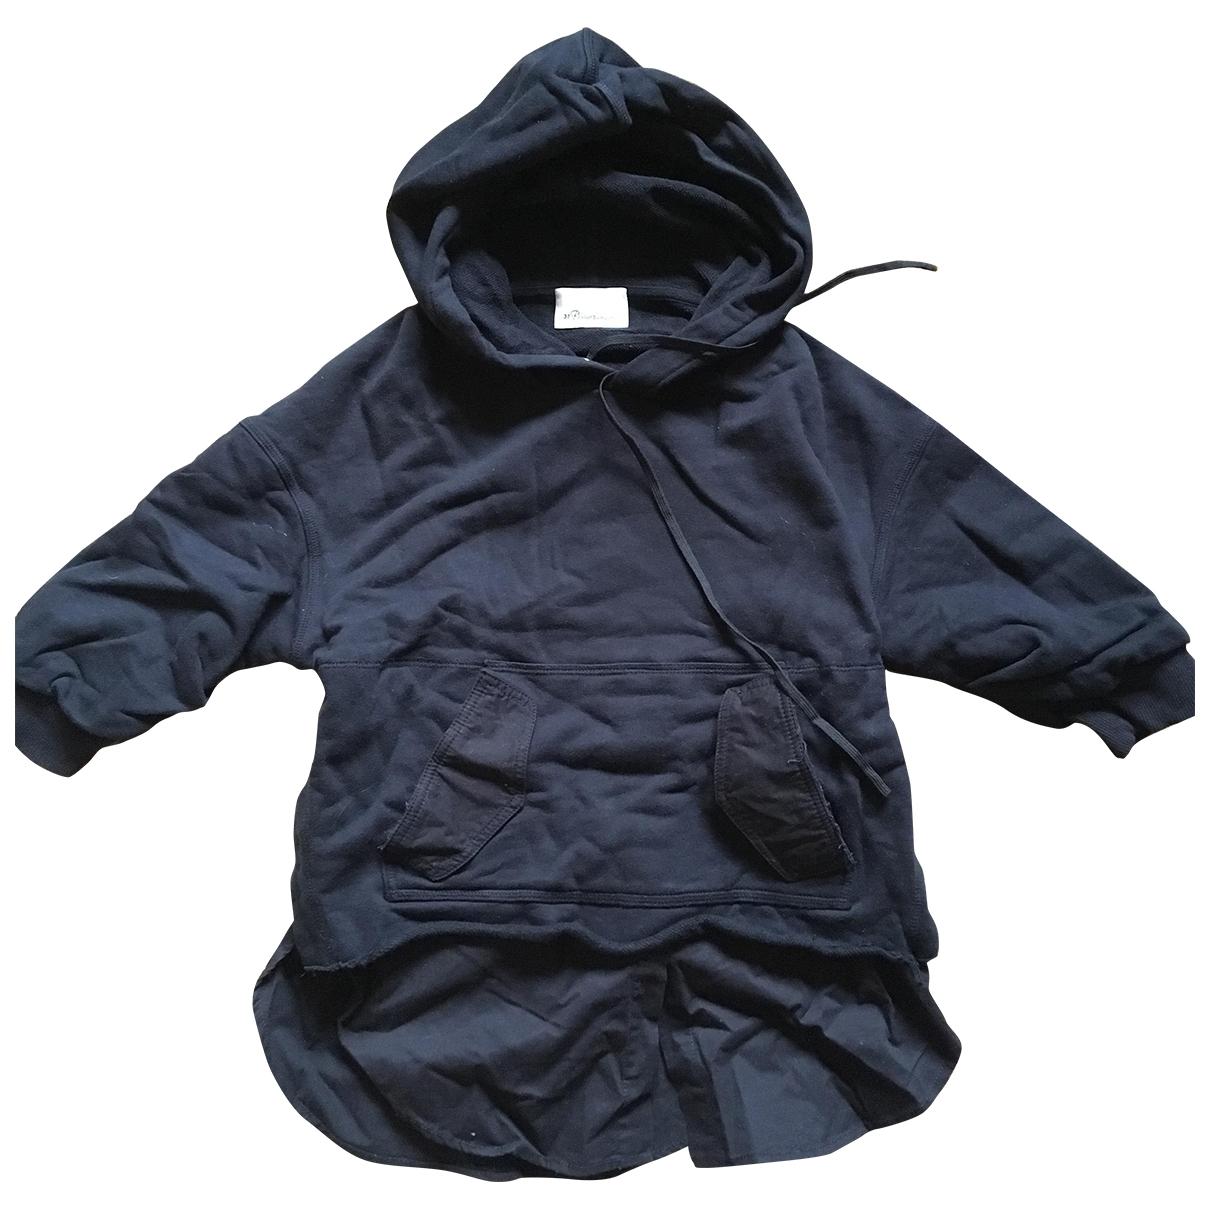 3.1 Phillip Lim \N Black Cotton Knitwear for Women S International